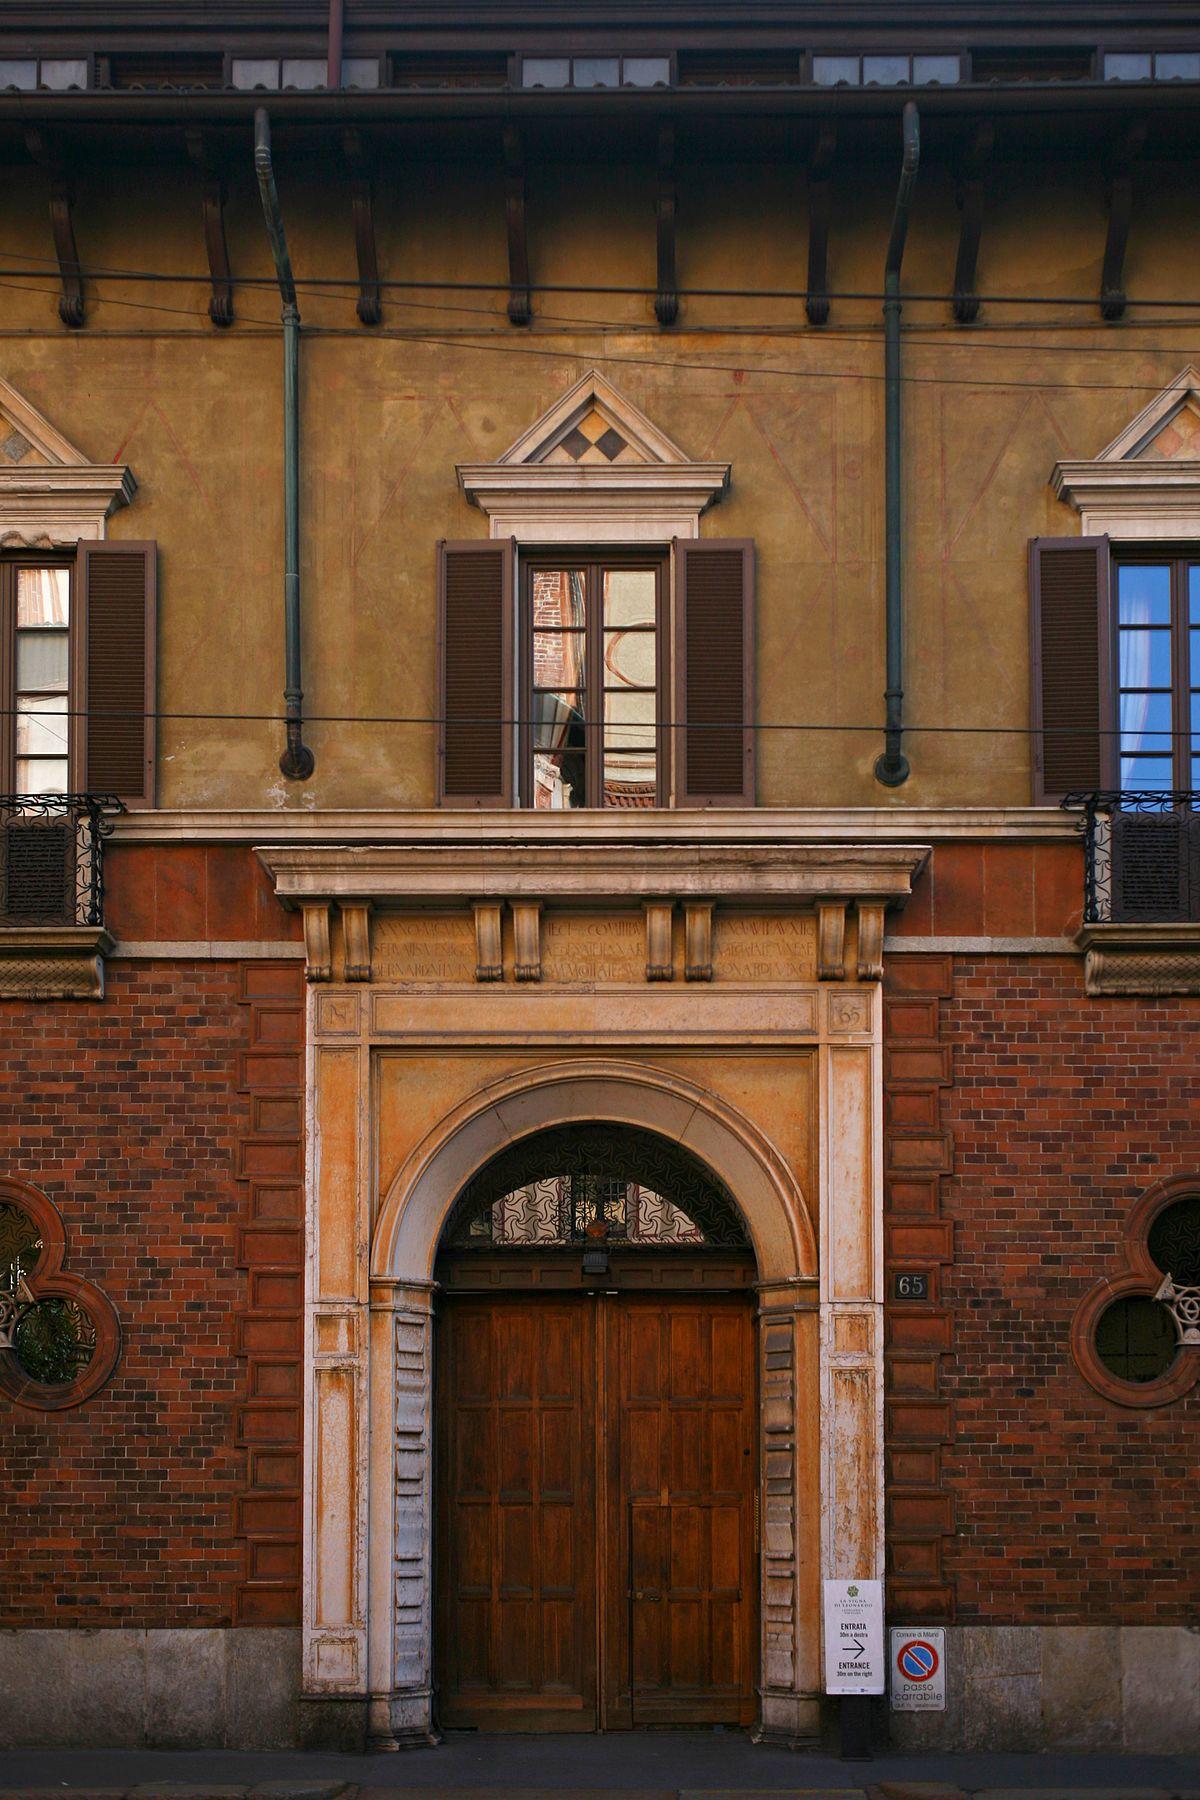 1200px-Casa_degli_Atellani%2C_corso_Magenta%2C_65%2C_Milano.jpg